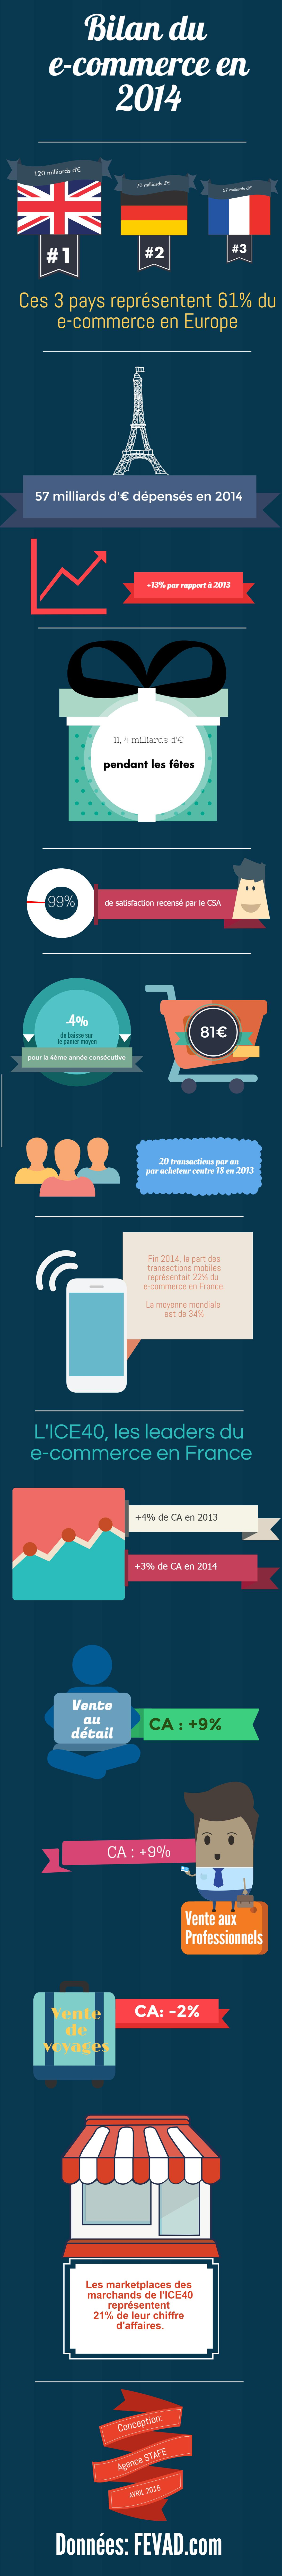 Tetrapolis - bilan du e-commerce 2014